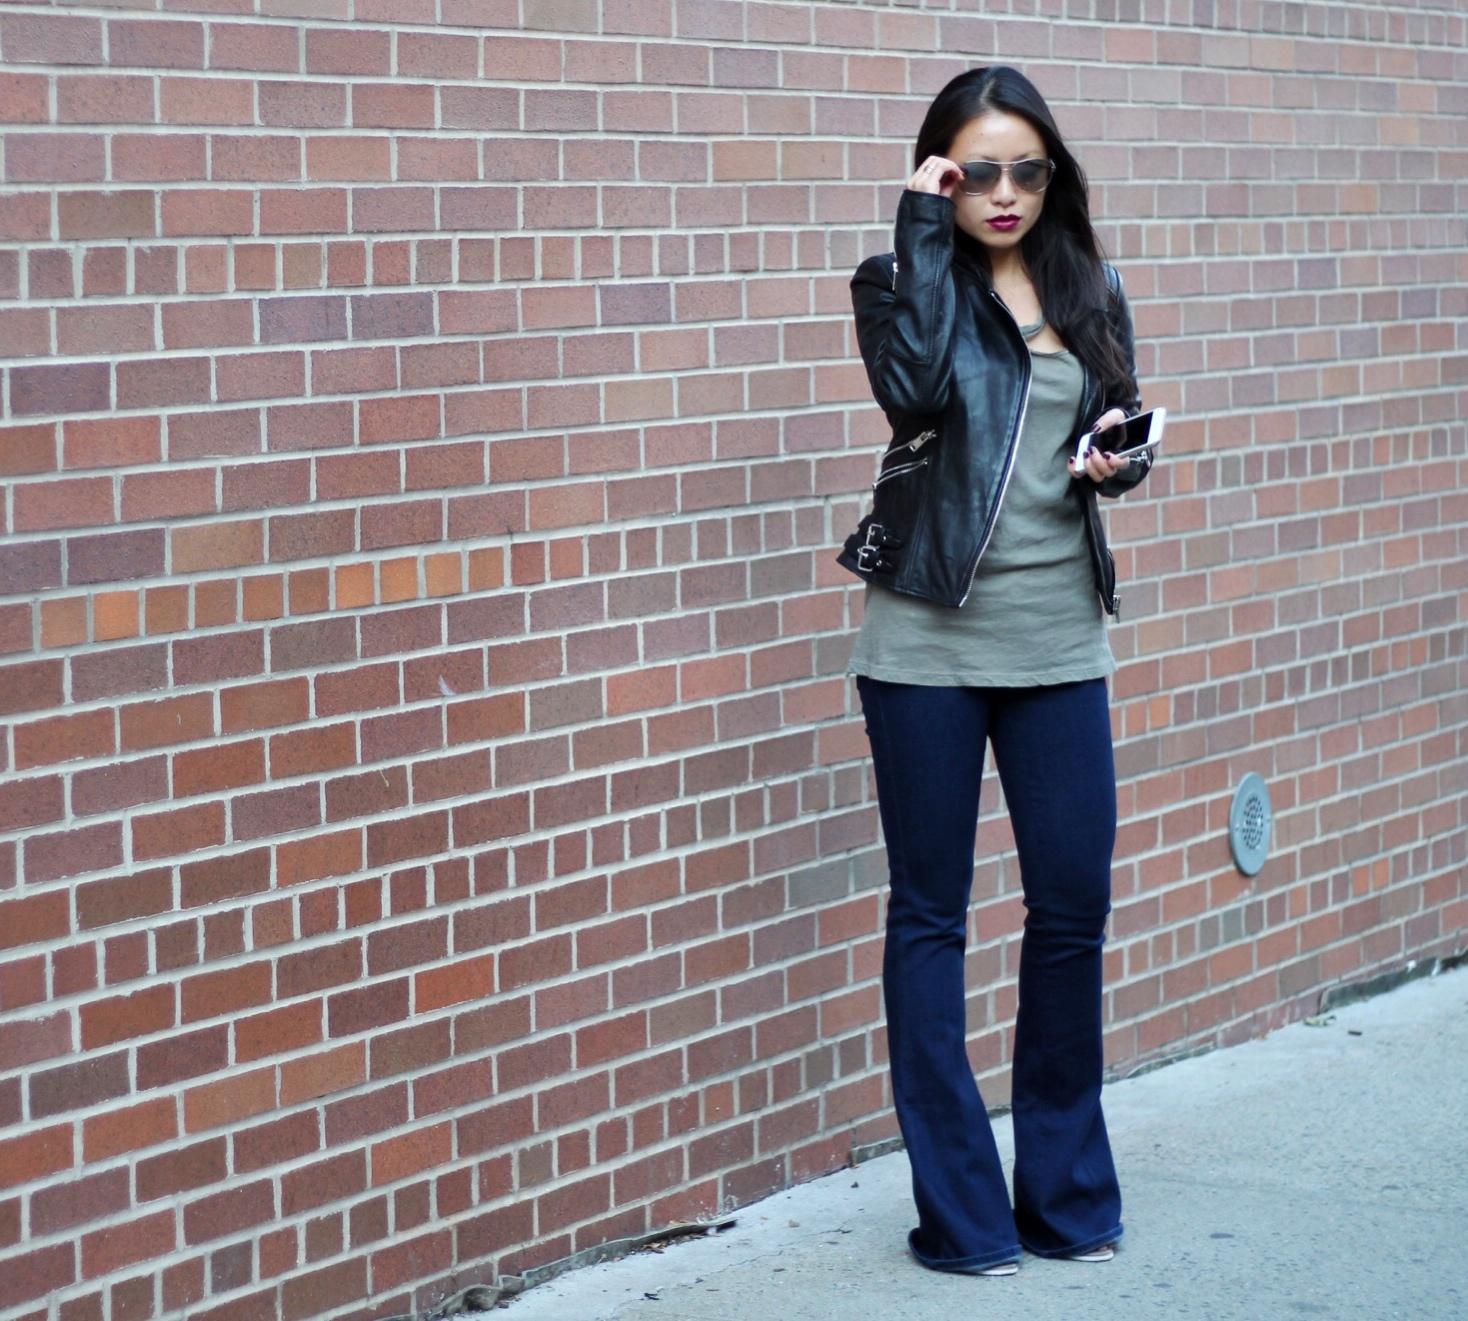 L'Agence Elysee low rise flares LNA desert crew tee Zara leather jacket